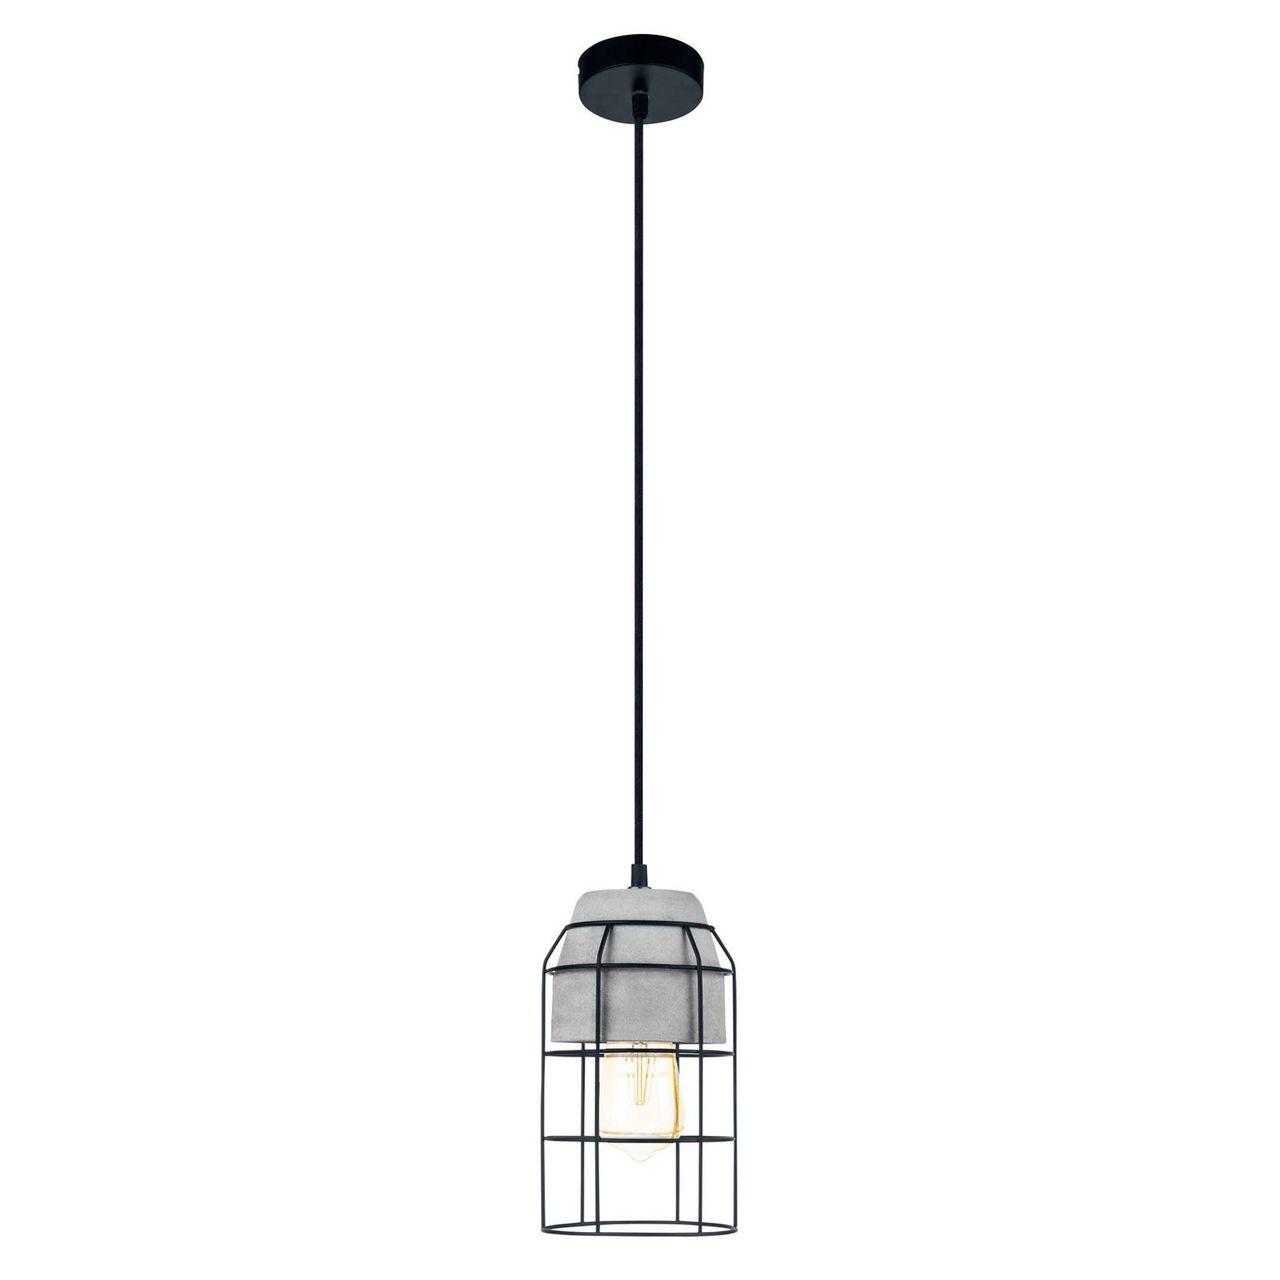 Подвесной светильник Eglo Consett 49783 eglo подвесной светильник eglo razoni 94388